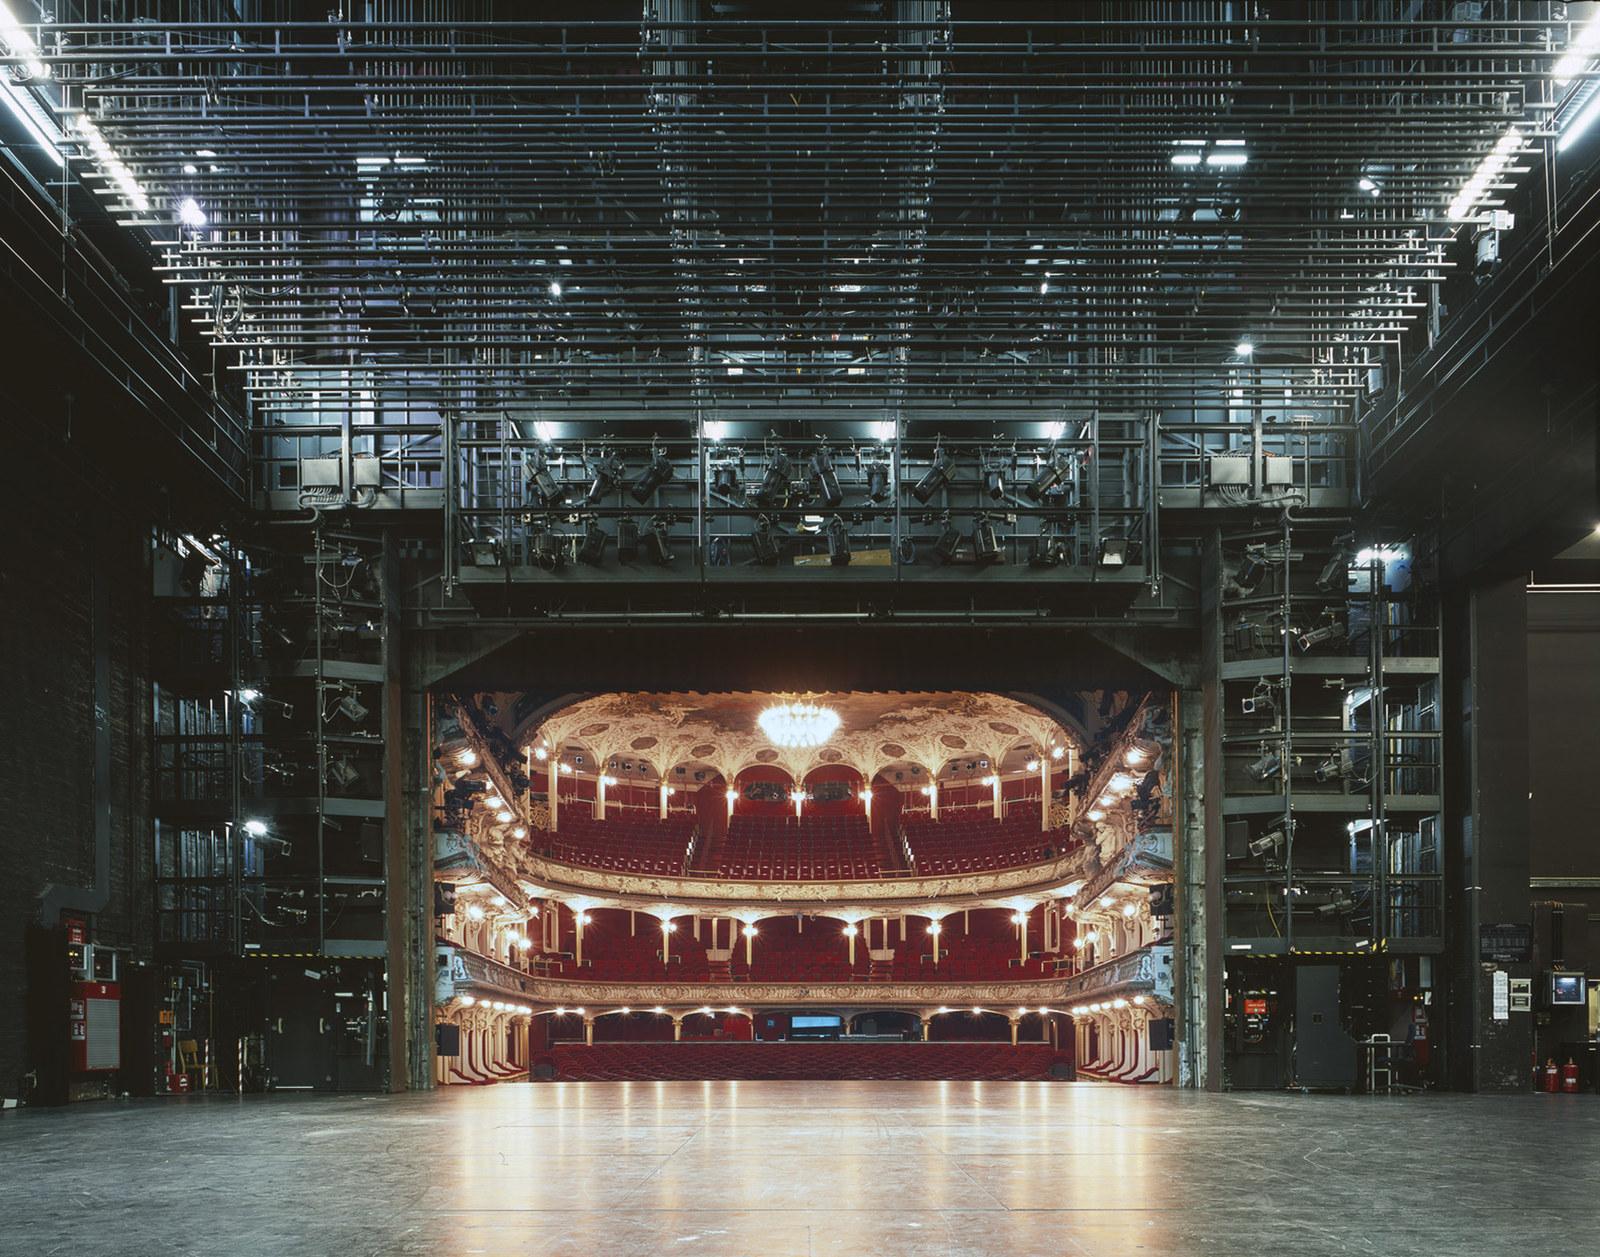 Немецкий драматический театр (Deutsches Schauspielhaus), Гамбург